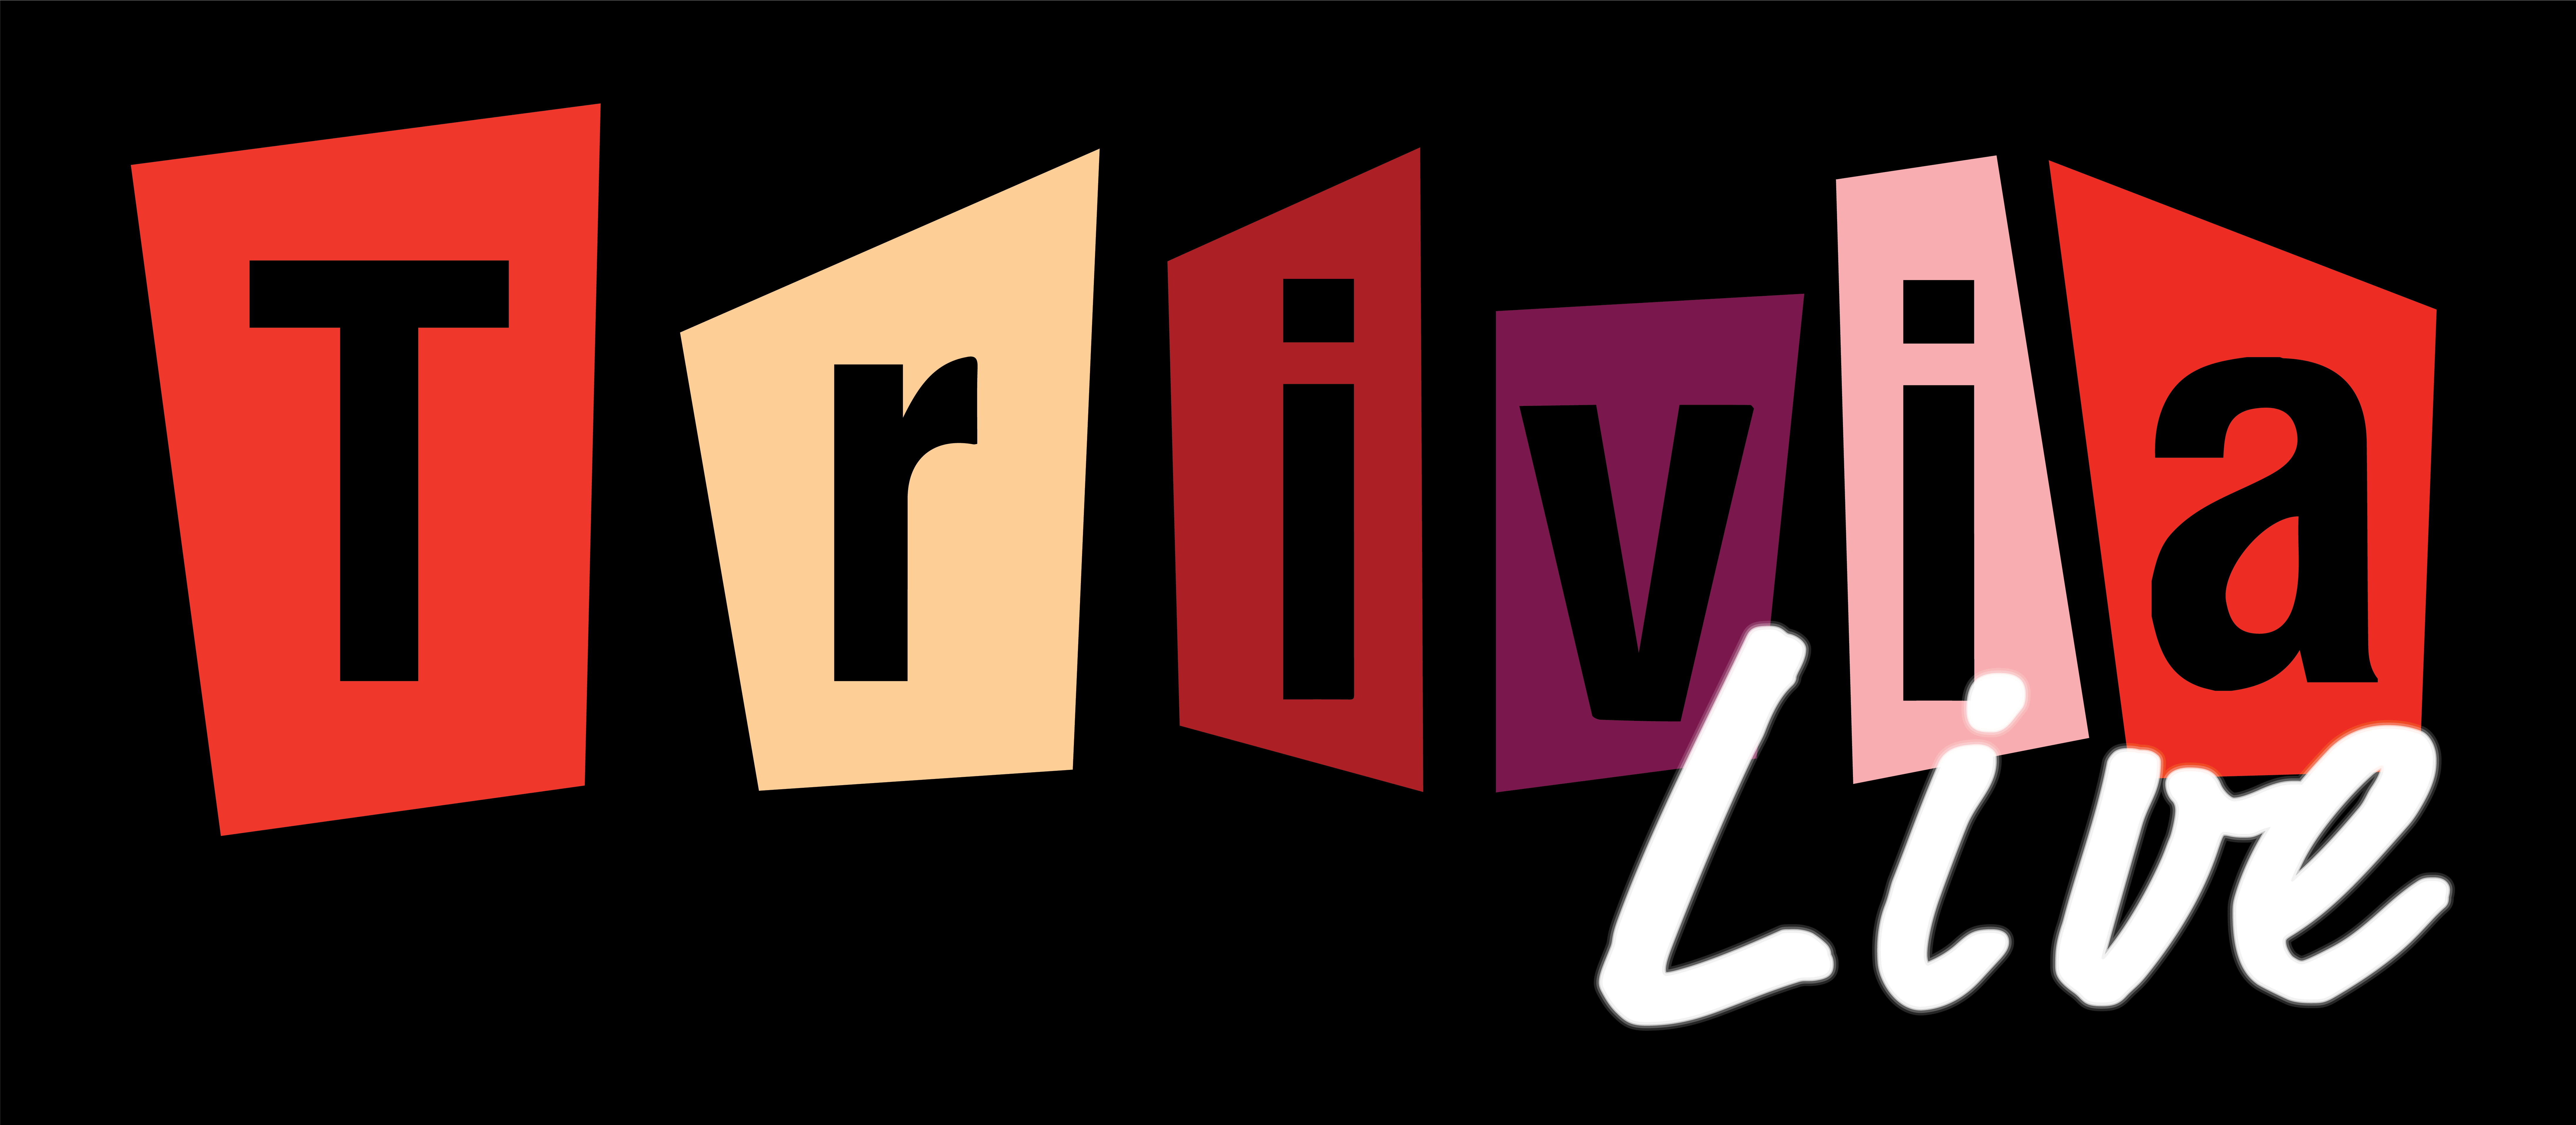 AARP20_FF_Trivia-Live_LOGO_black